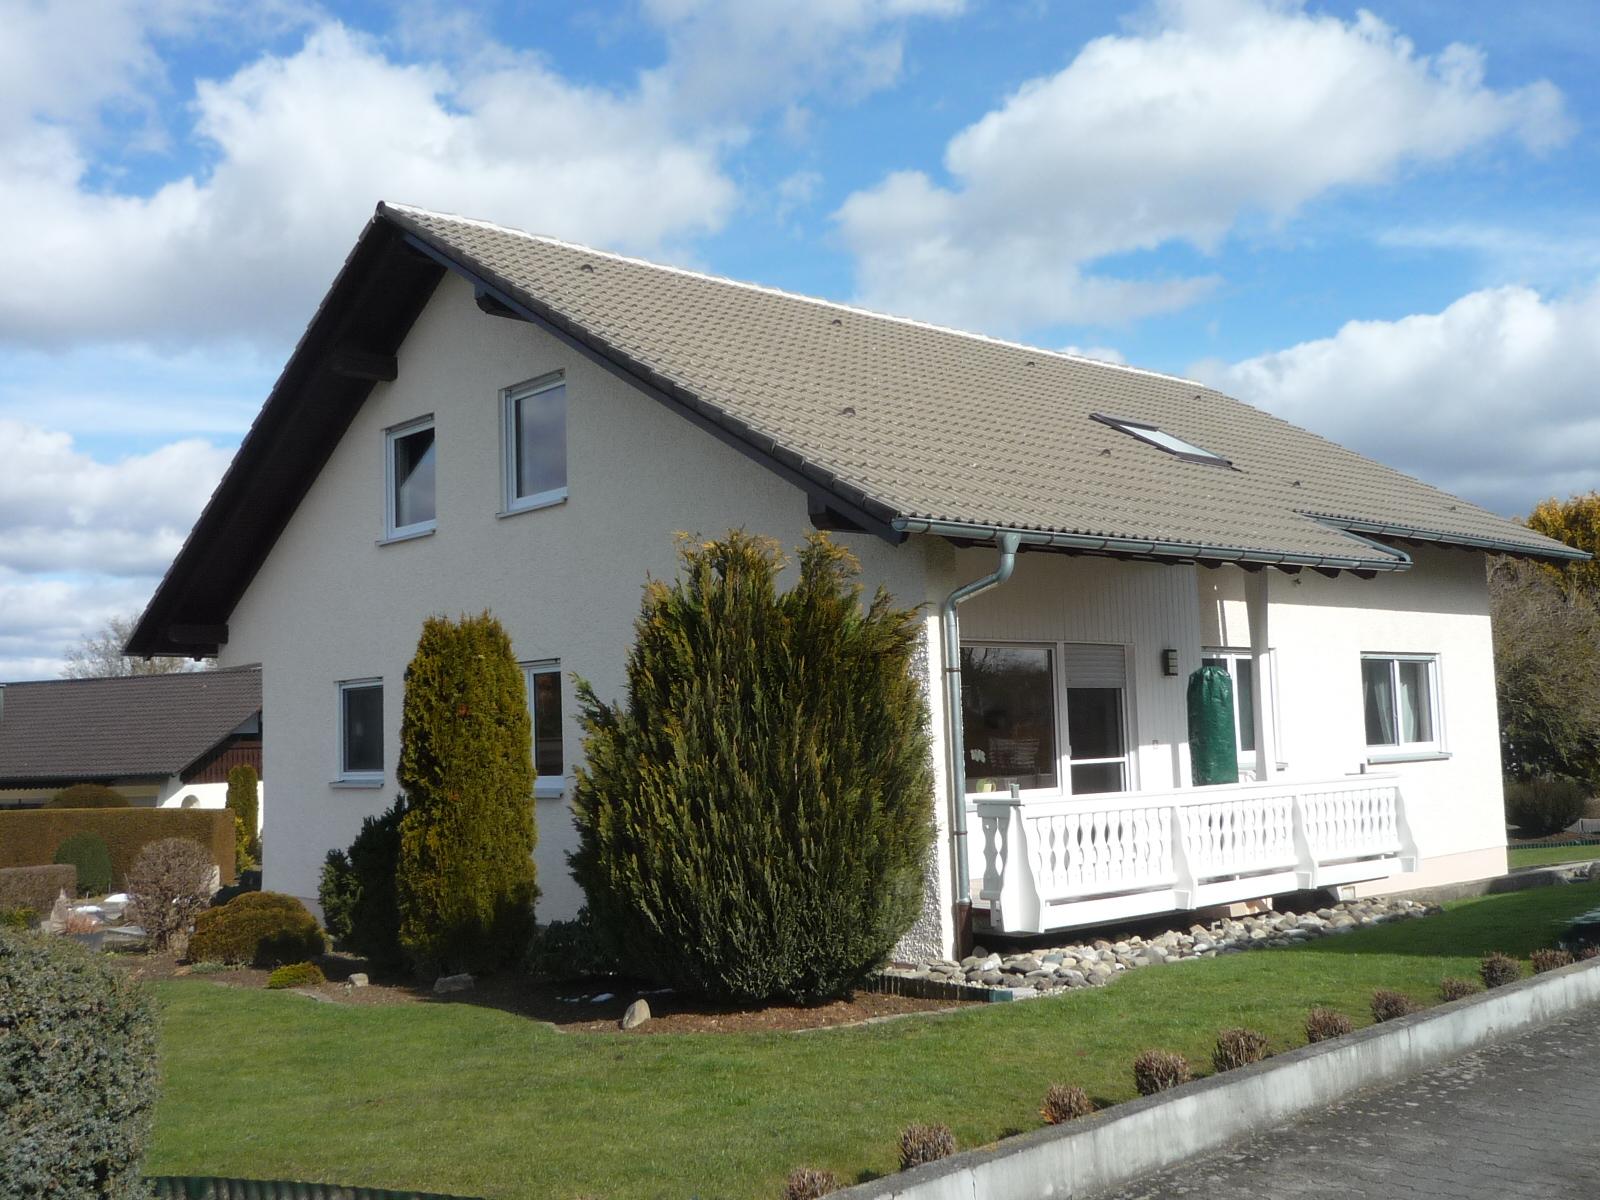 Jagode-Immobilien 1_2FamHaus Dietenheim-OT